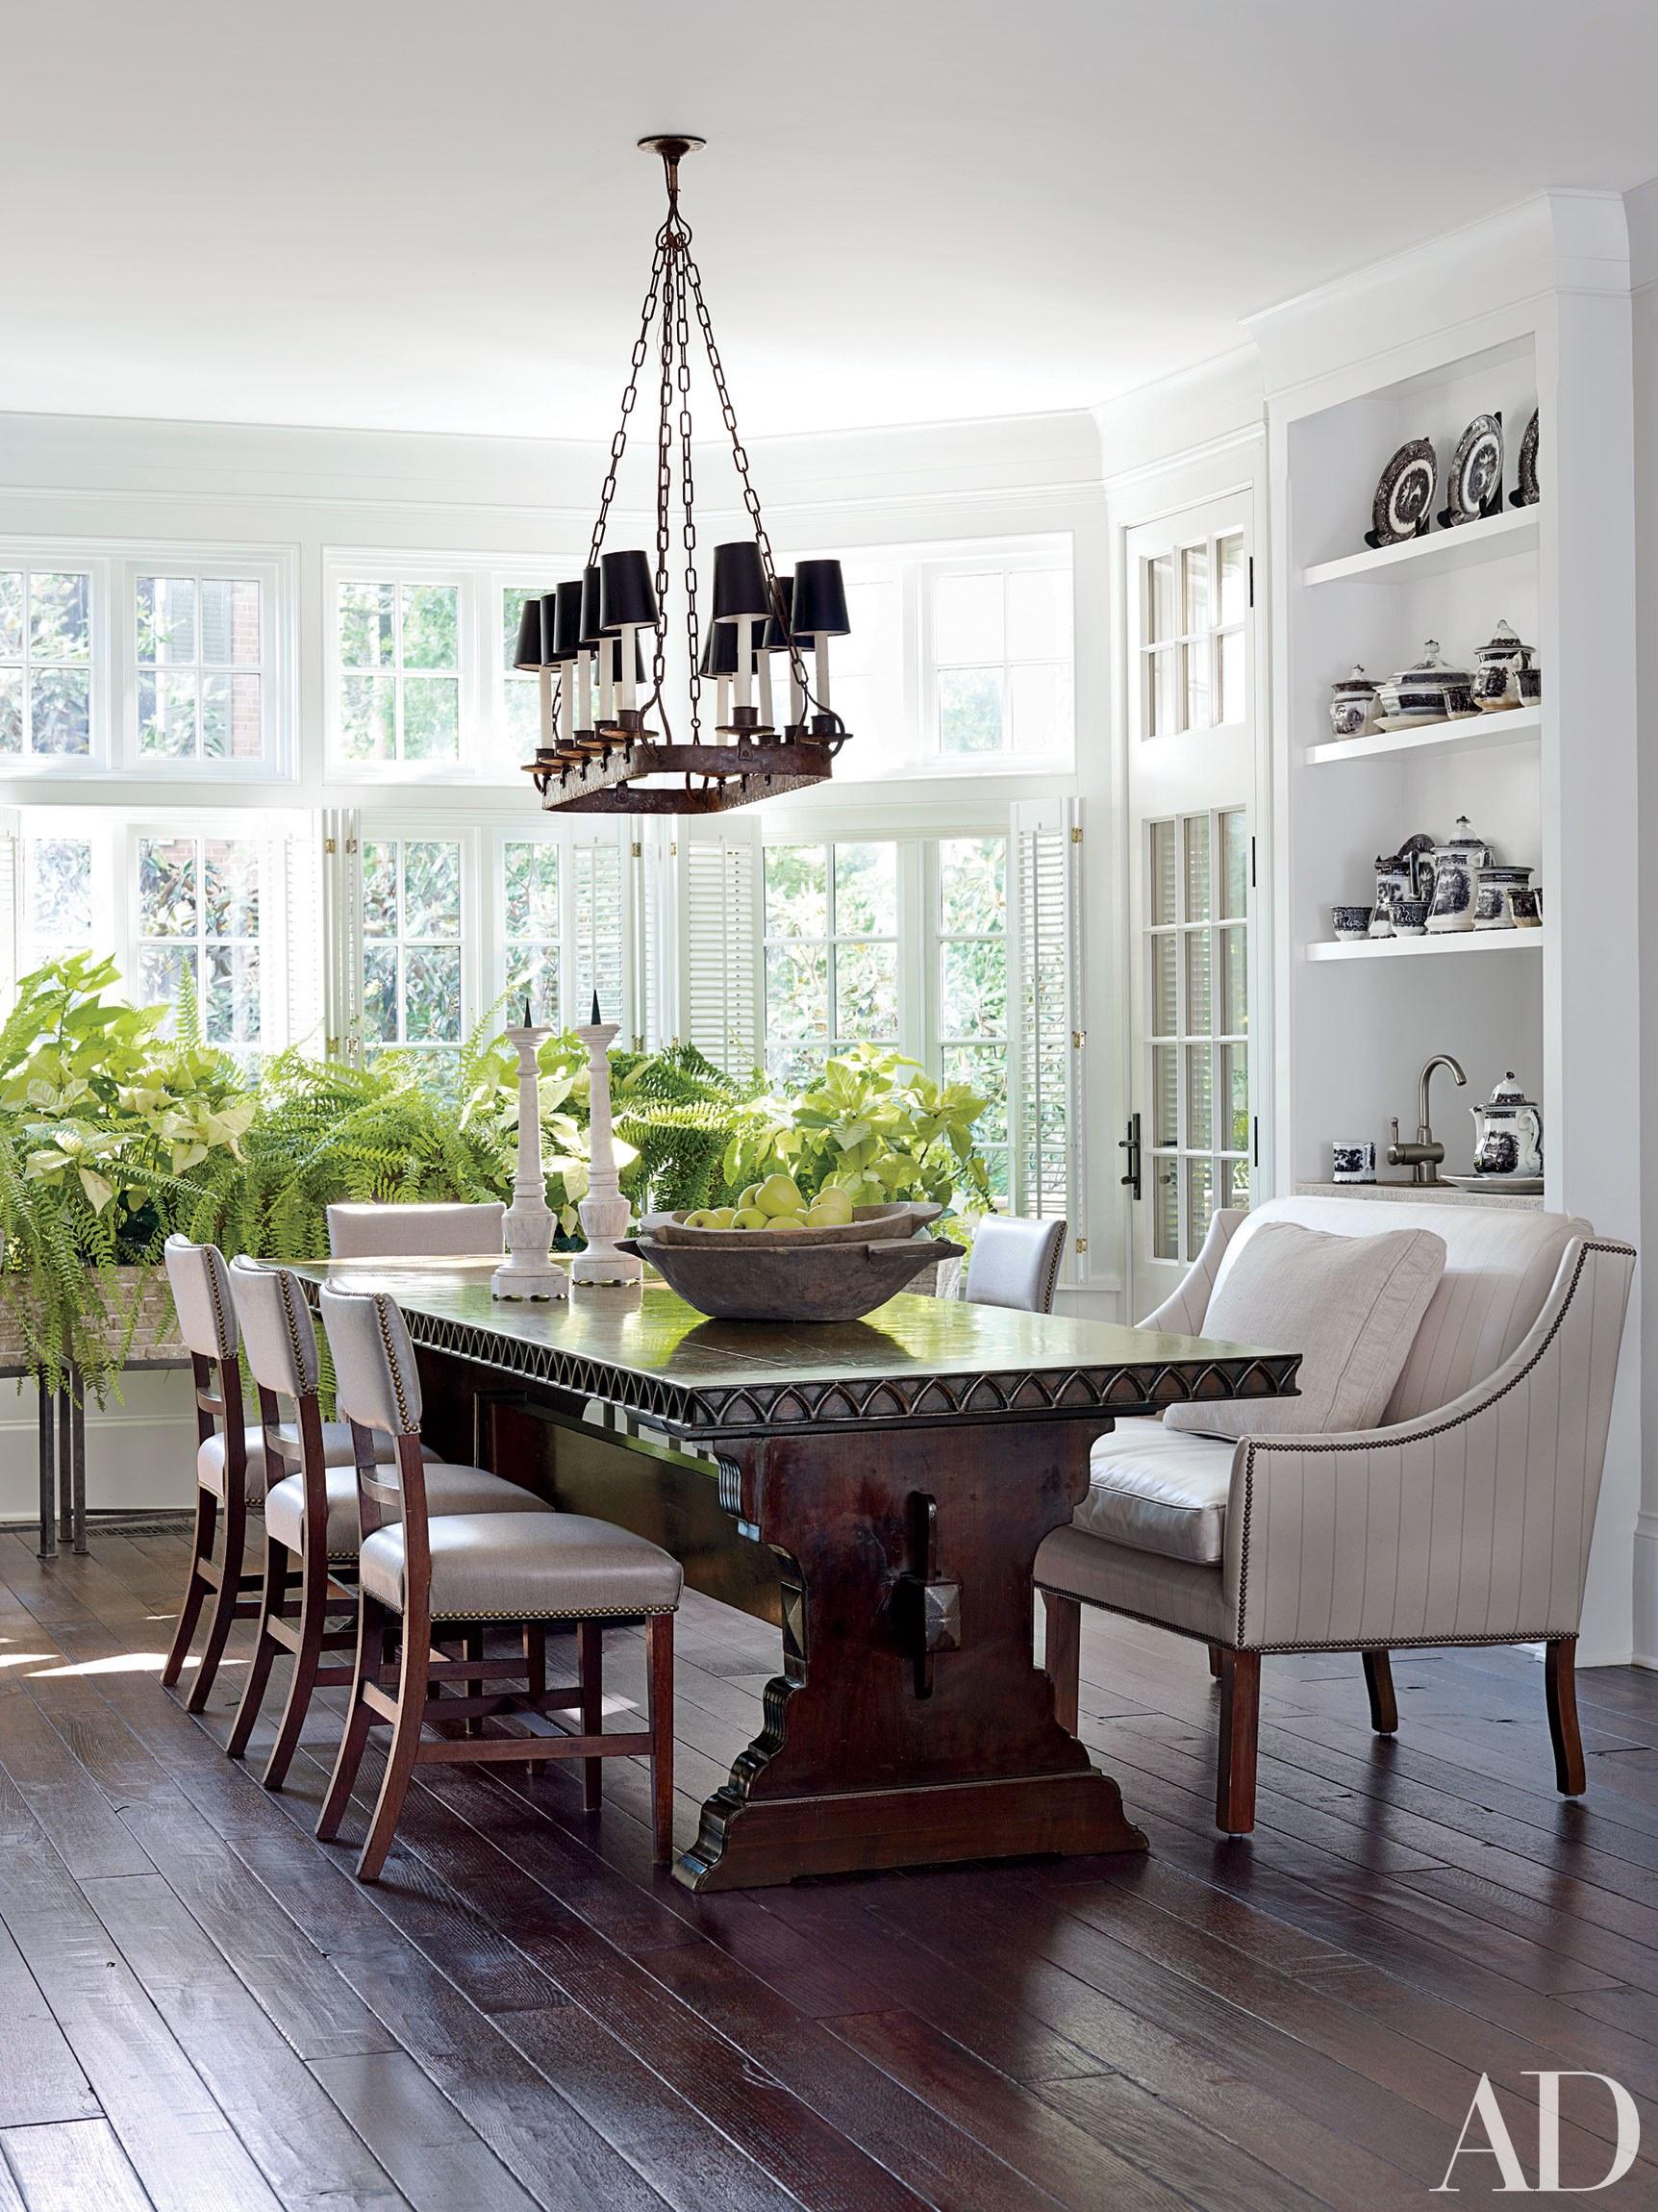 Home Design Inspiration By Darryl Carter